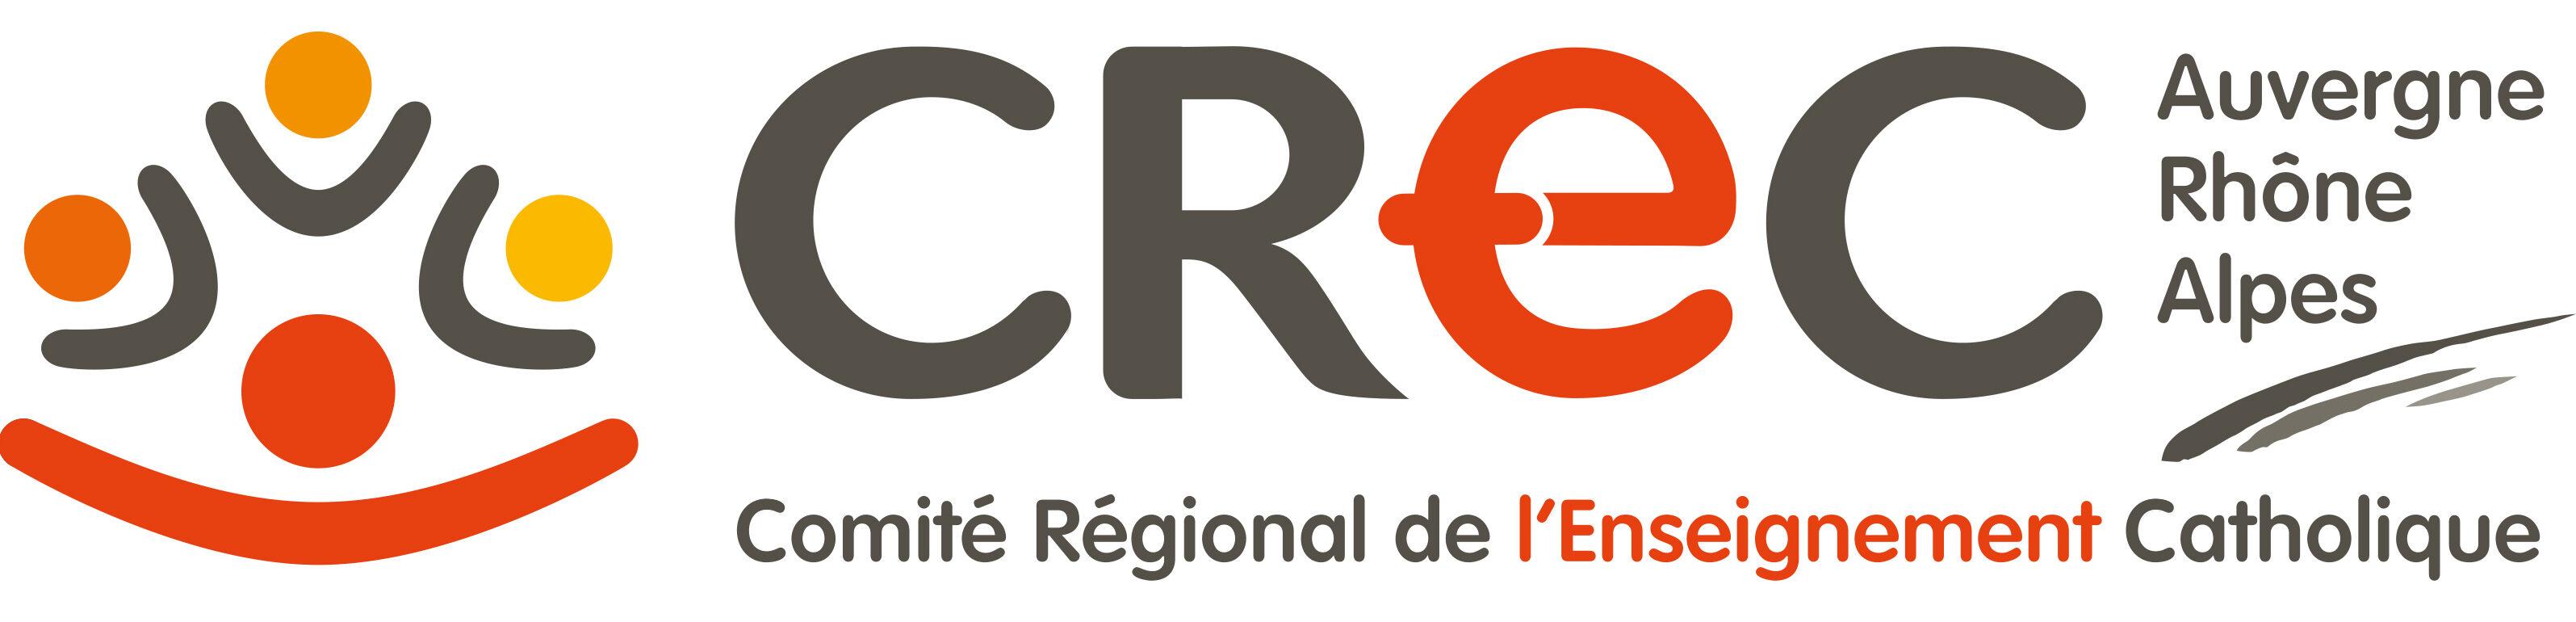 Logo CREC_couleur jpg.jpg